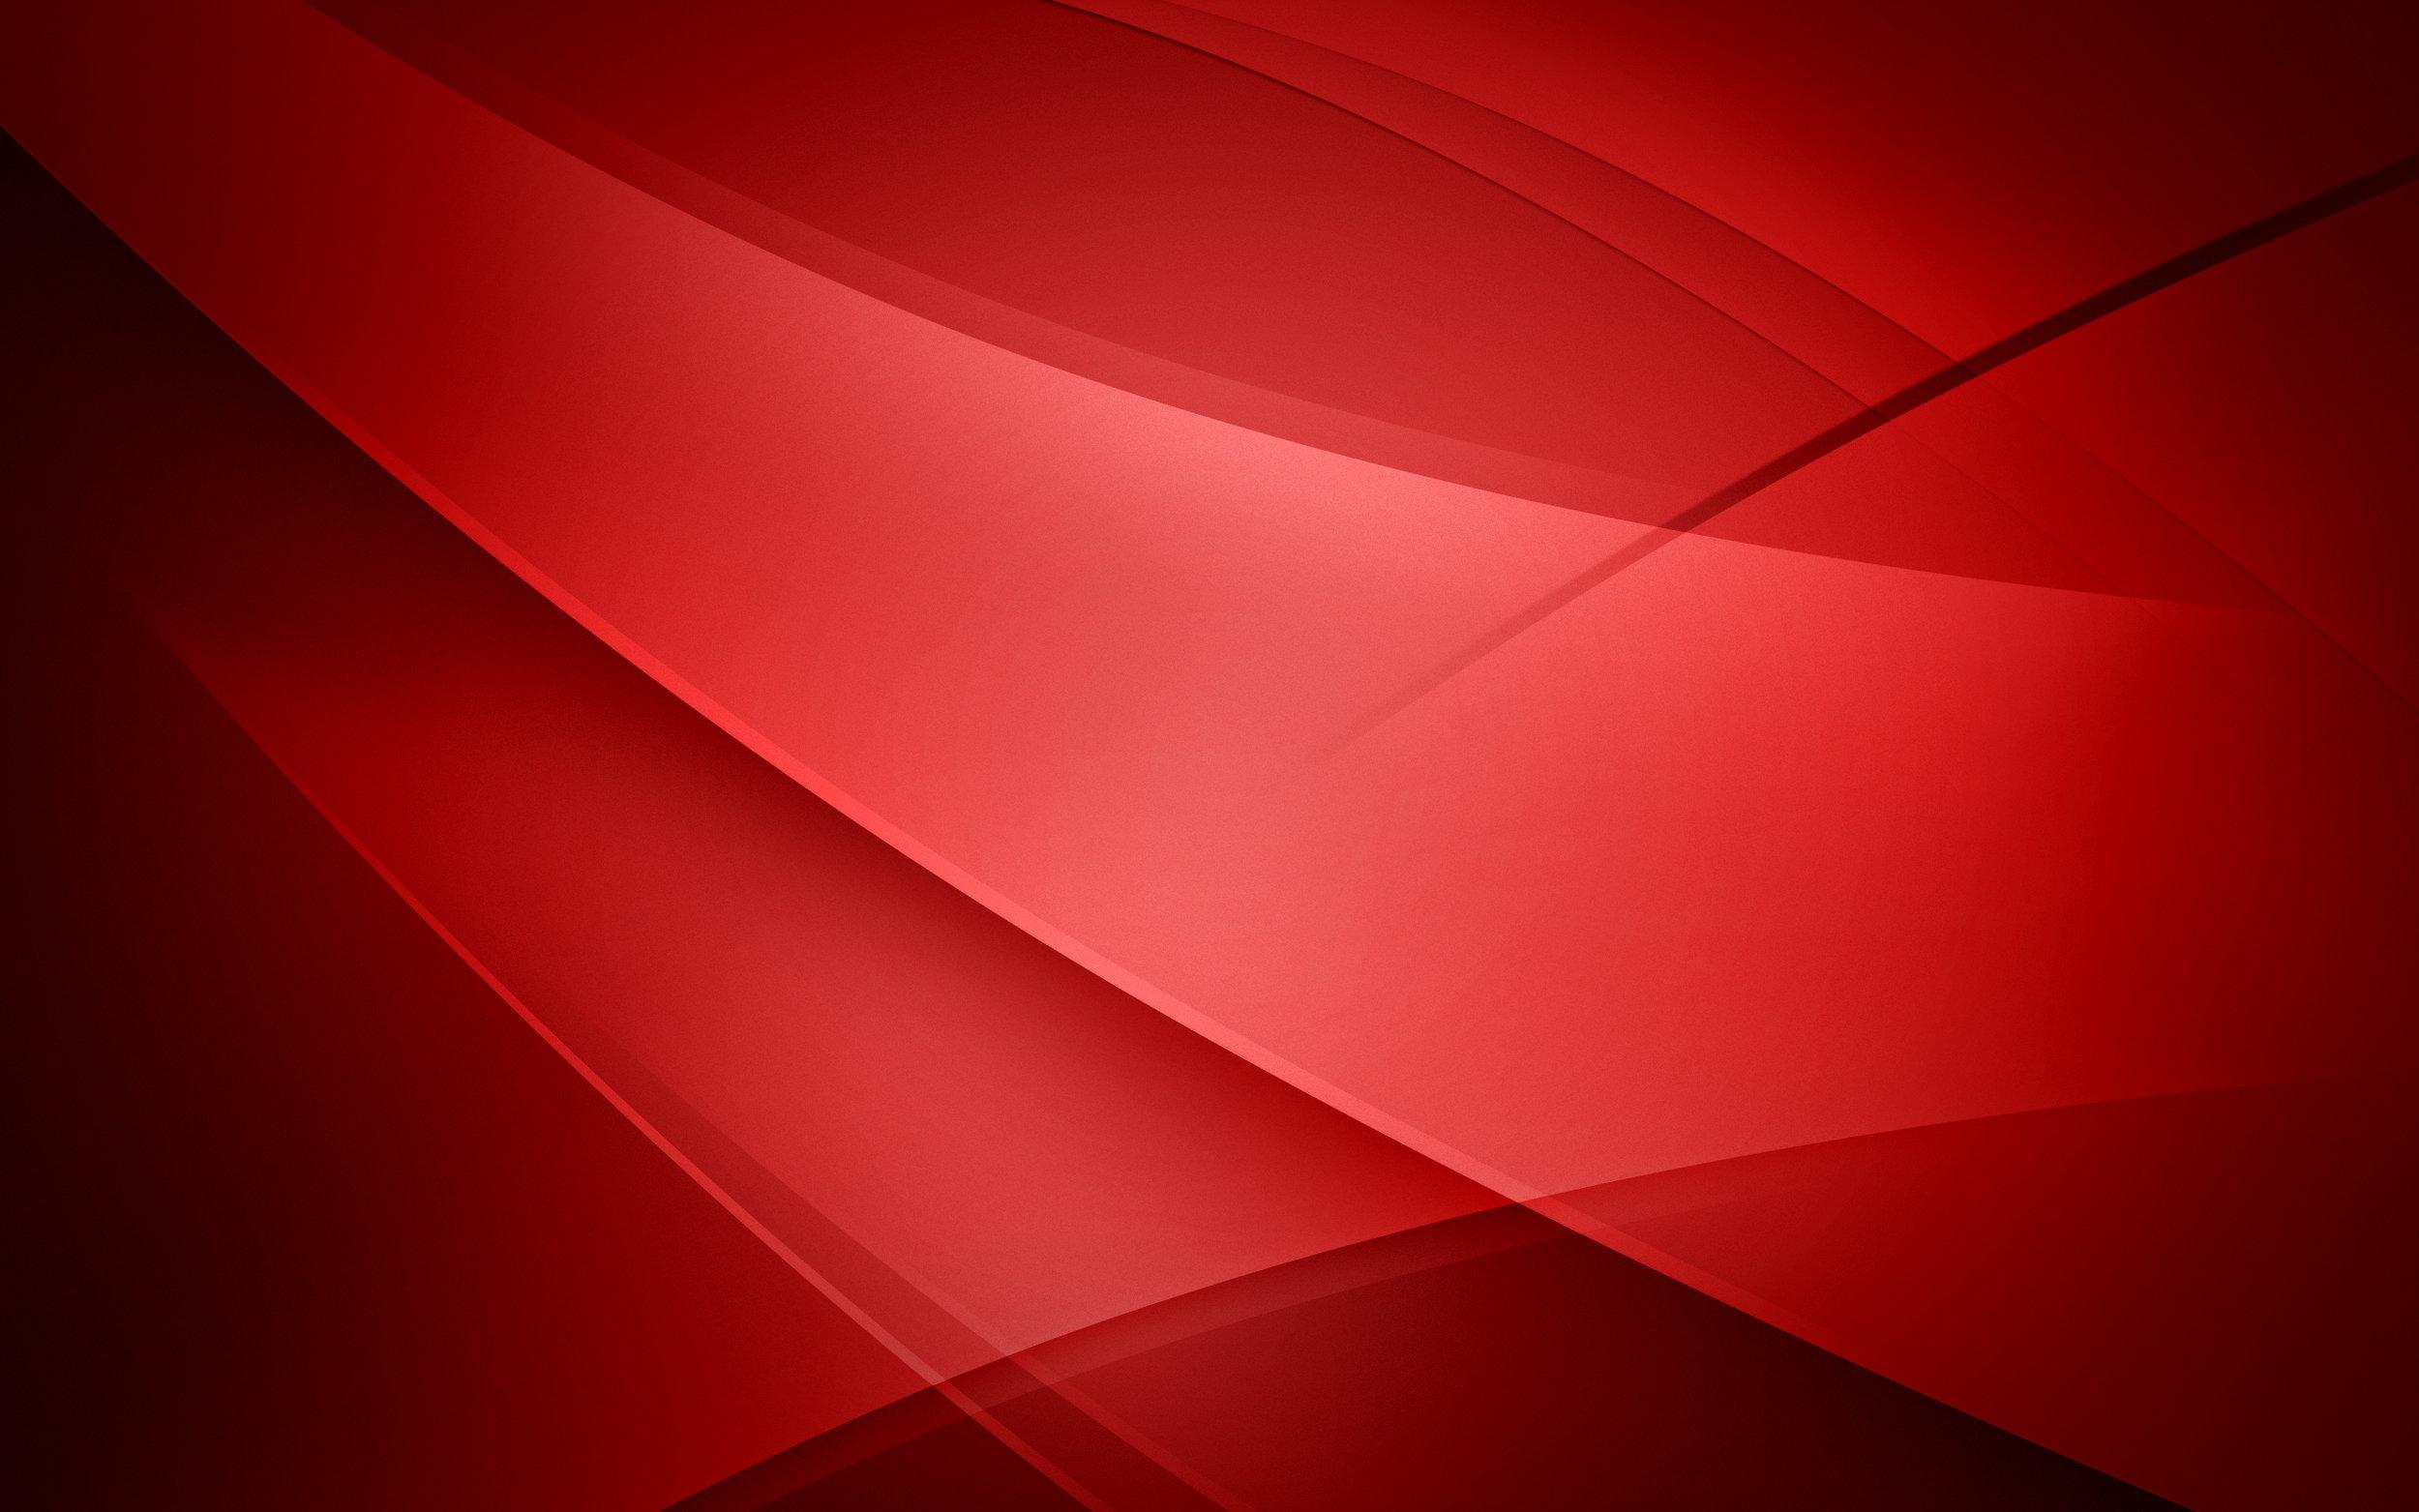 red-abstract-bg.jpg